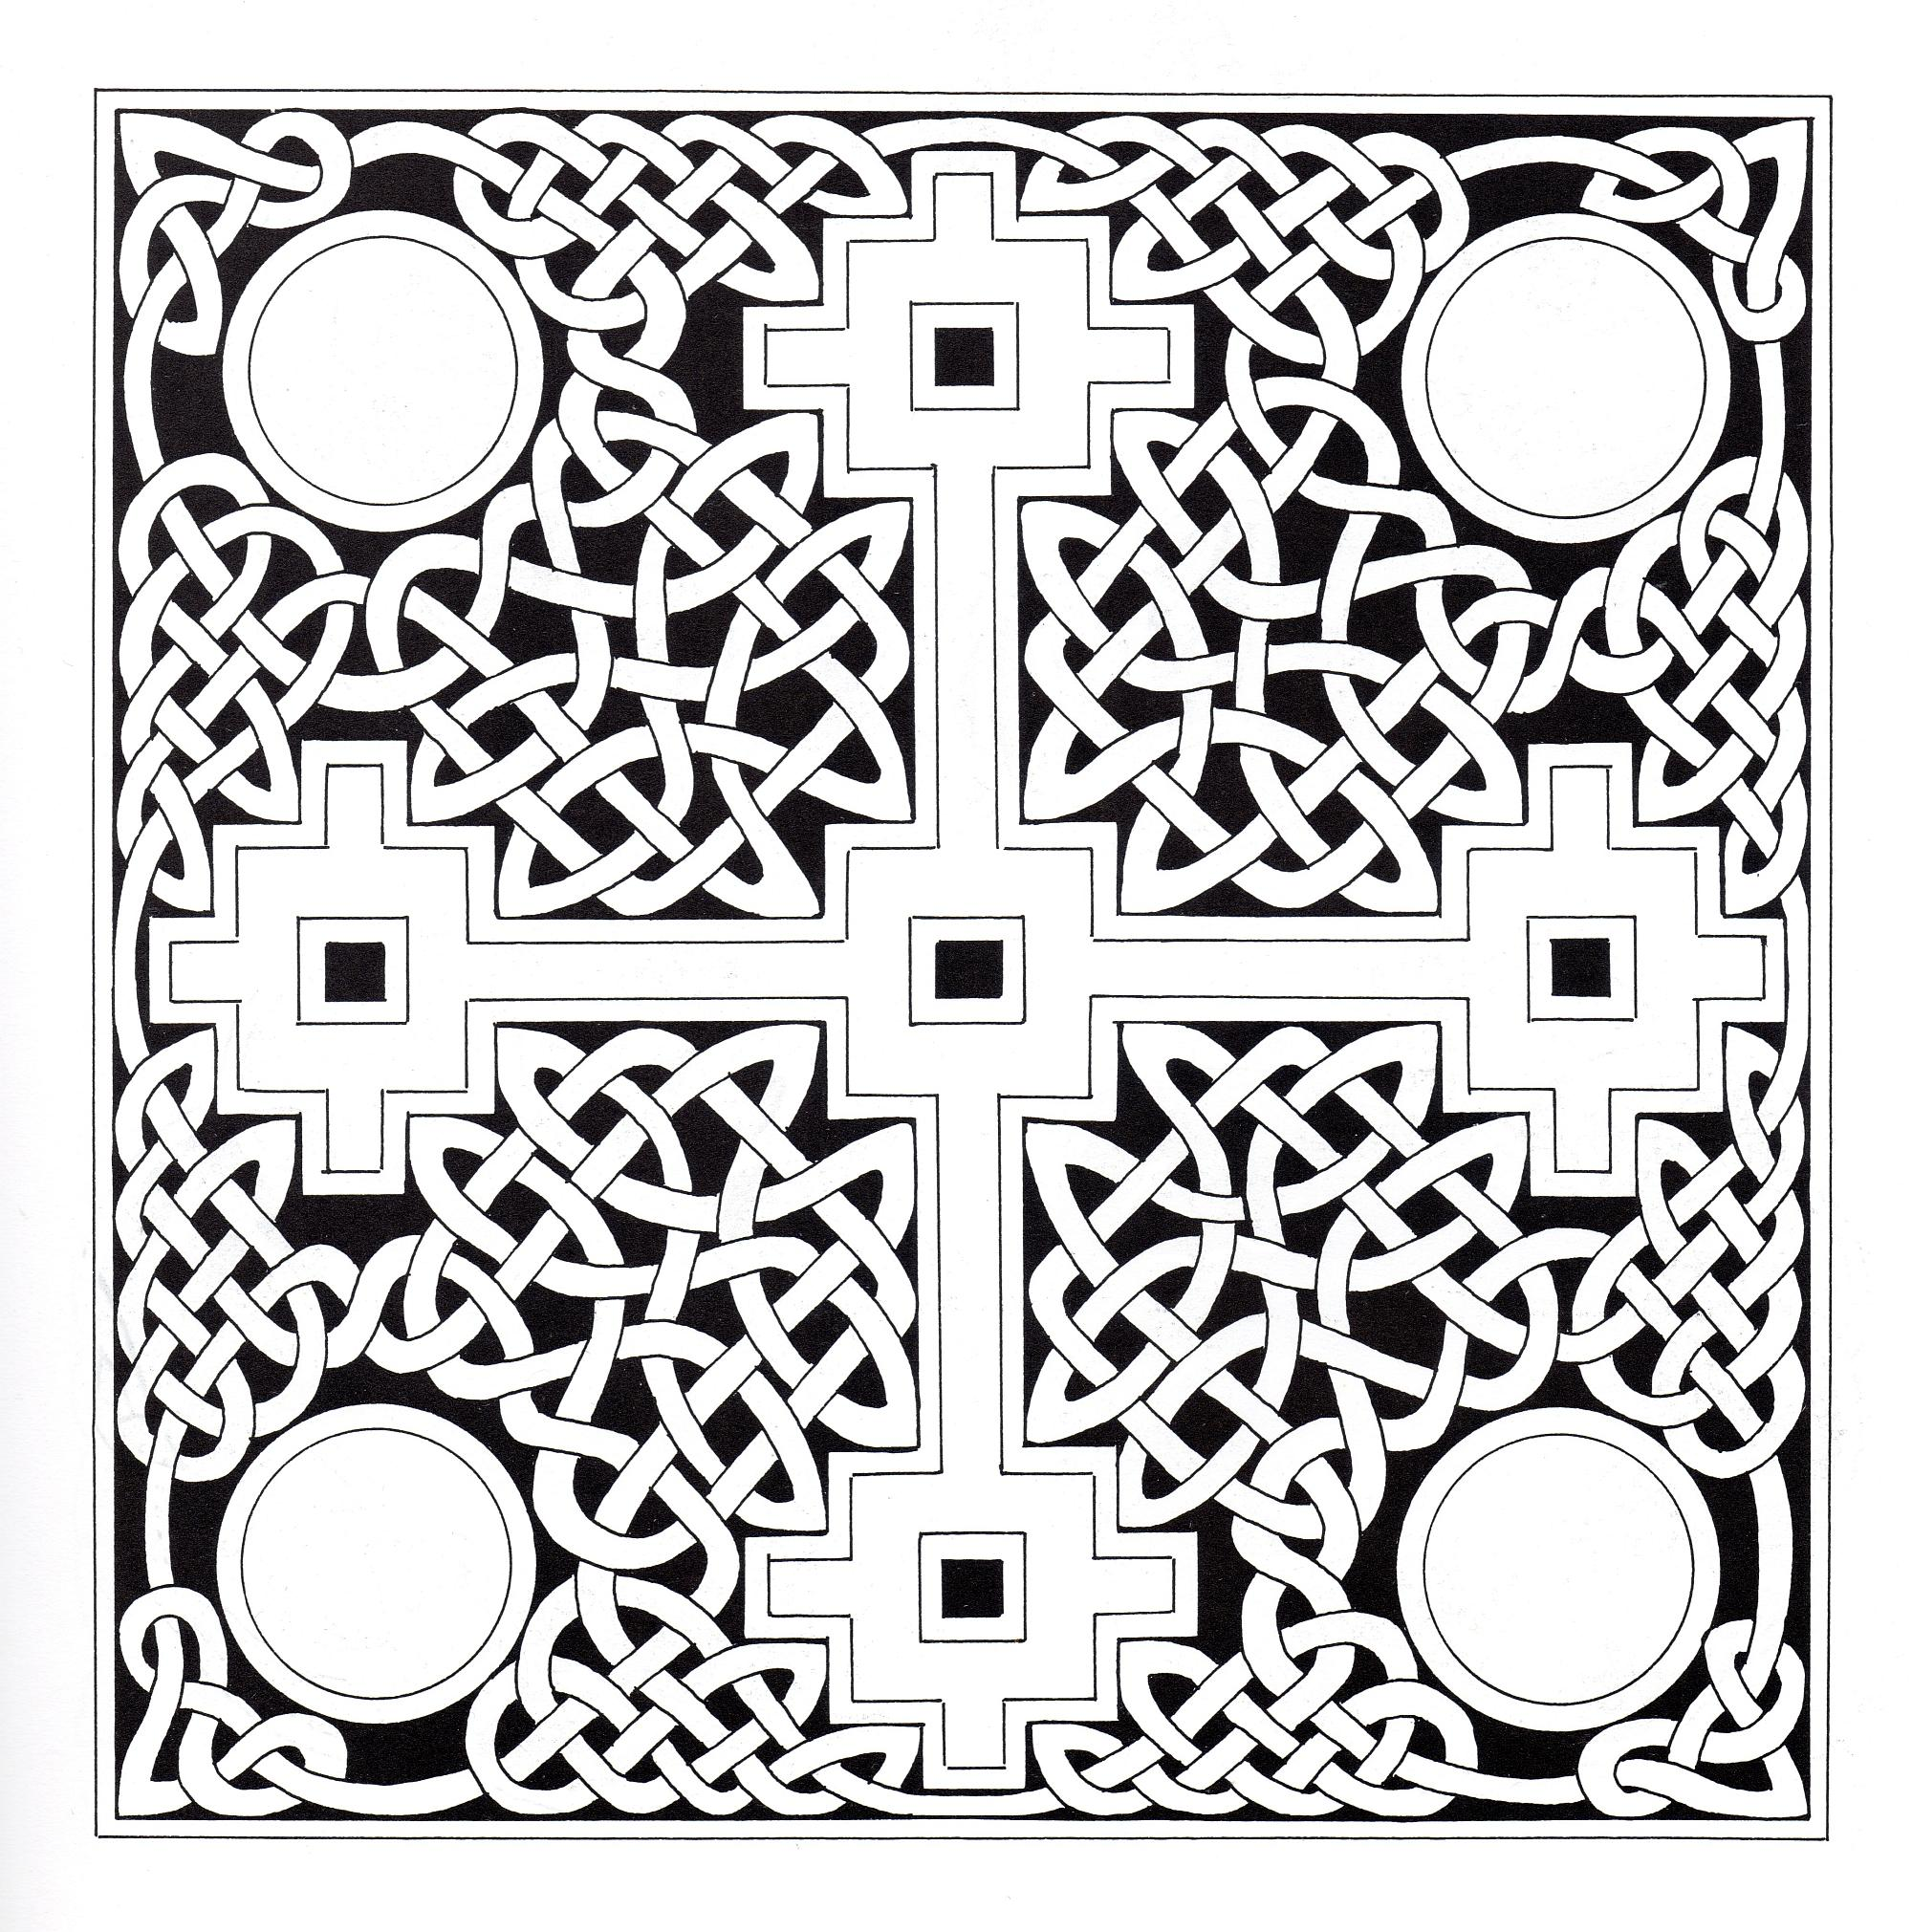 Squared Celtic art pattern